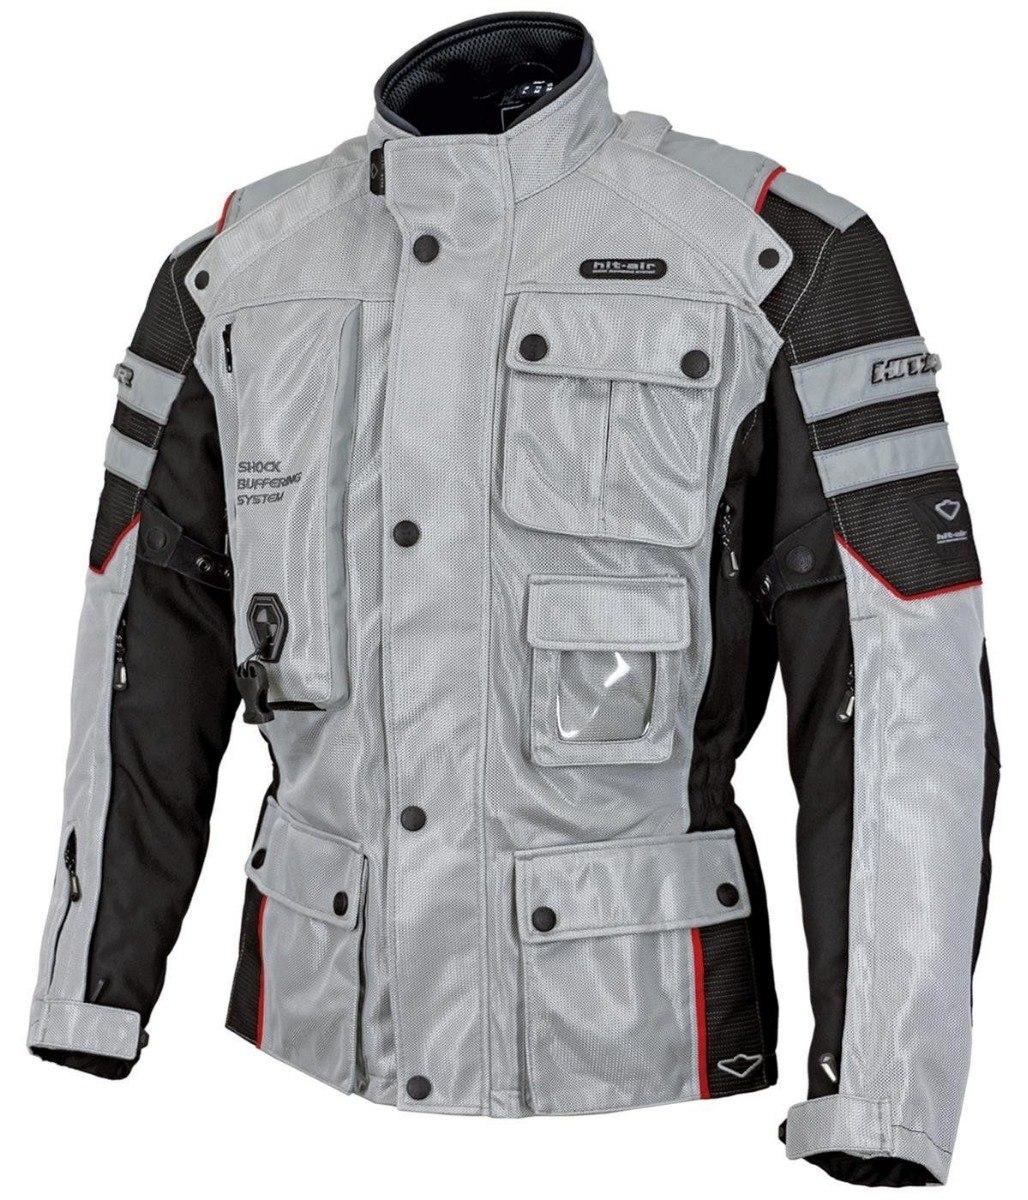 02f3f2829 chamarra-hitair-airbag-nueva-moto-armadura-protecciones-D_NQ_NP_612435-MLM28180677578_092018-F.jpg